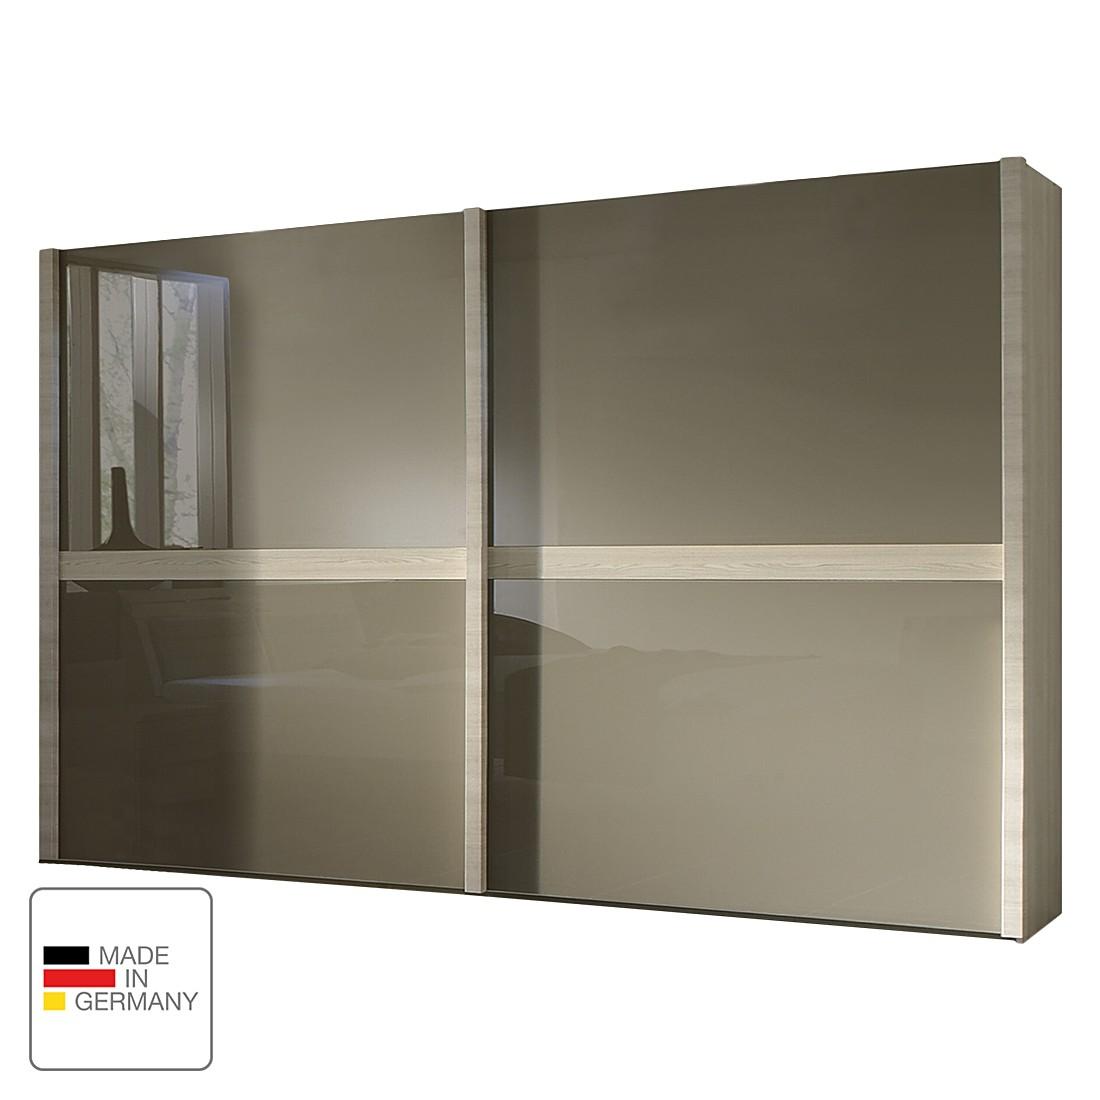 schwebet renschrank bolero ohne beleuchtung 250 cm 2 t rig sahara althoff g nstig. Black Bedroom Furniture Sets. Home Design Ideas